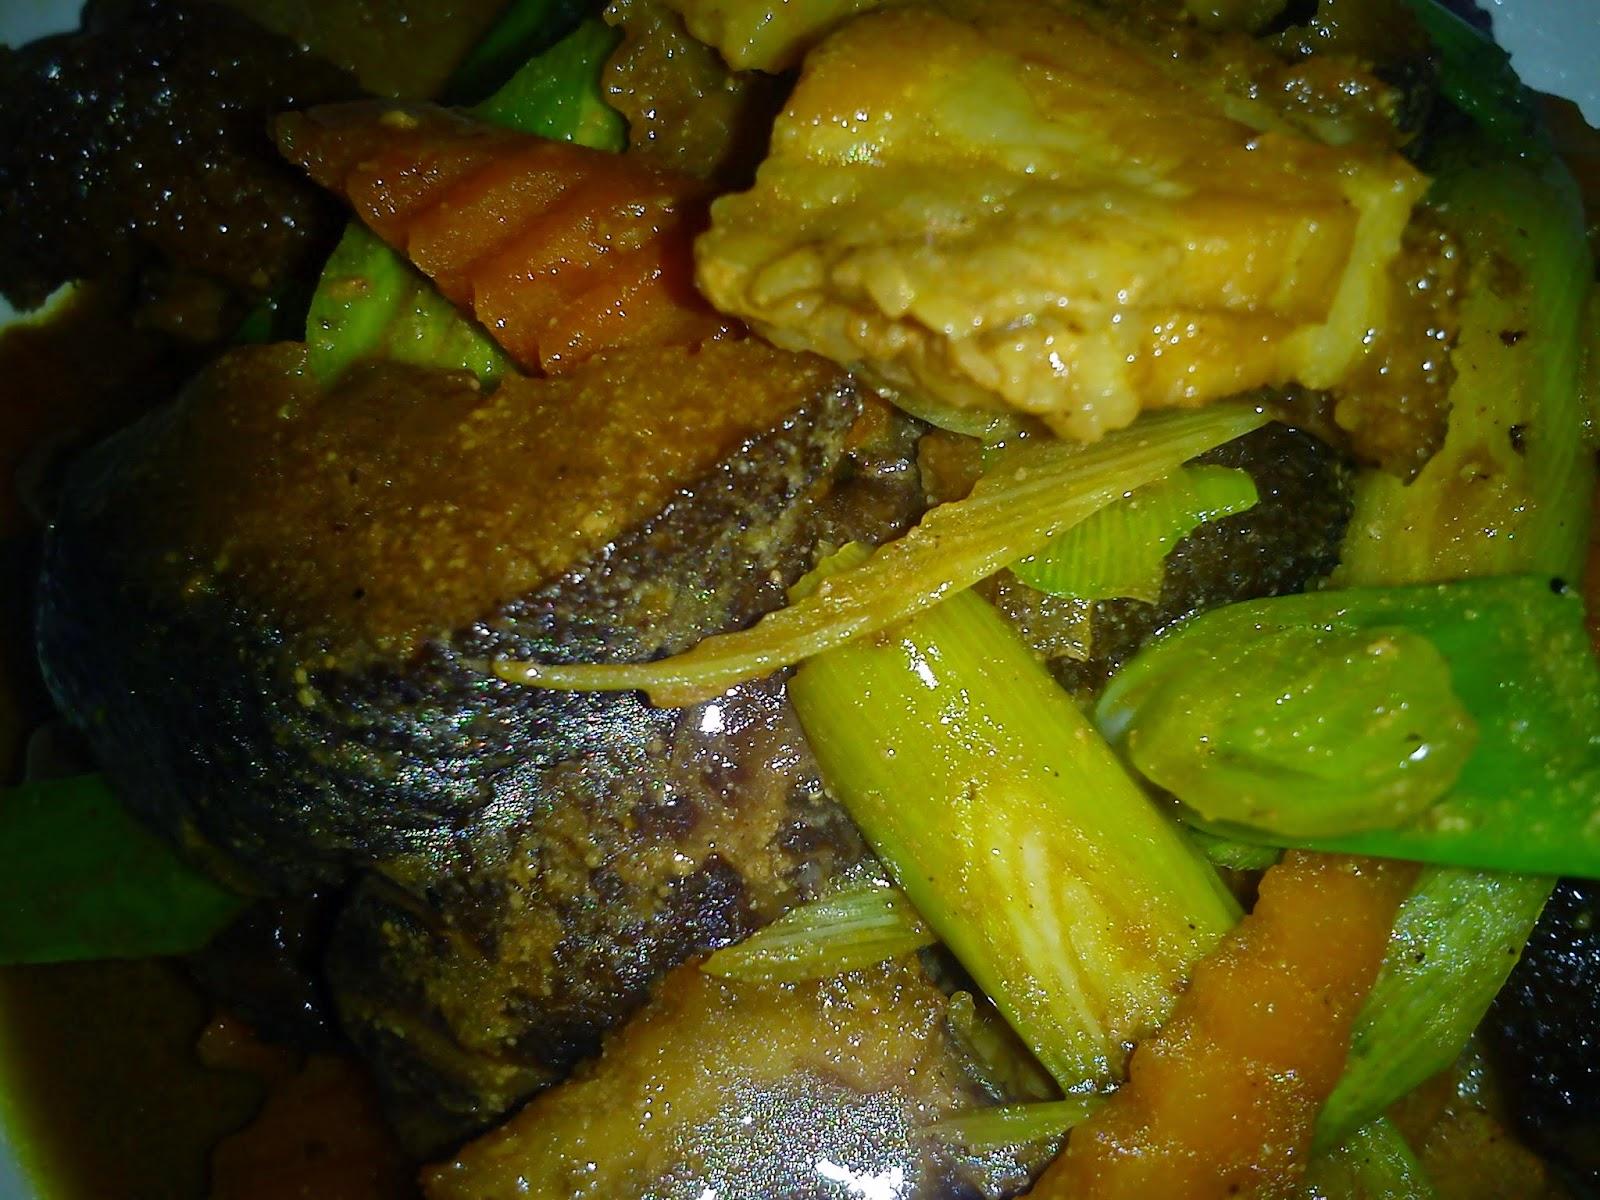 Cooking Pleasure: BRAISED SEA CUCUMBER WITH ROASTED PORK